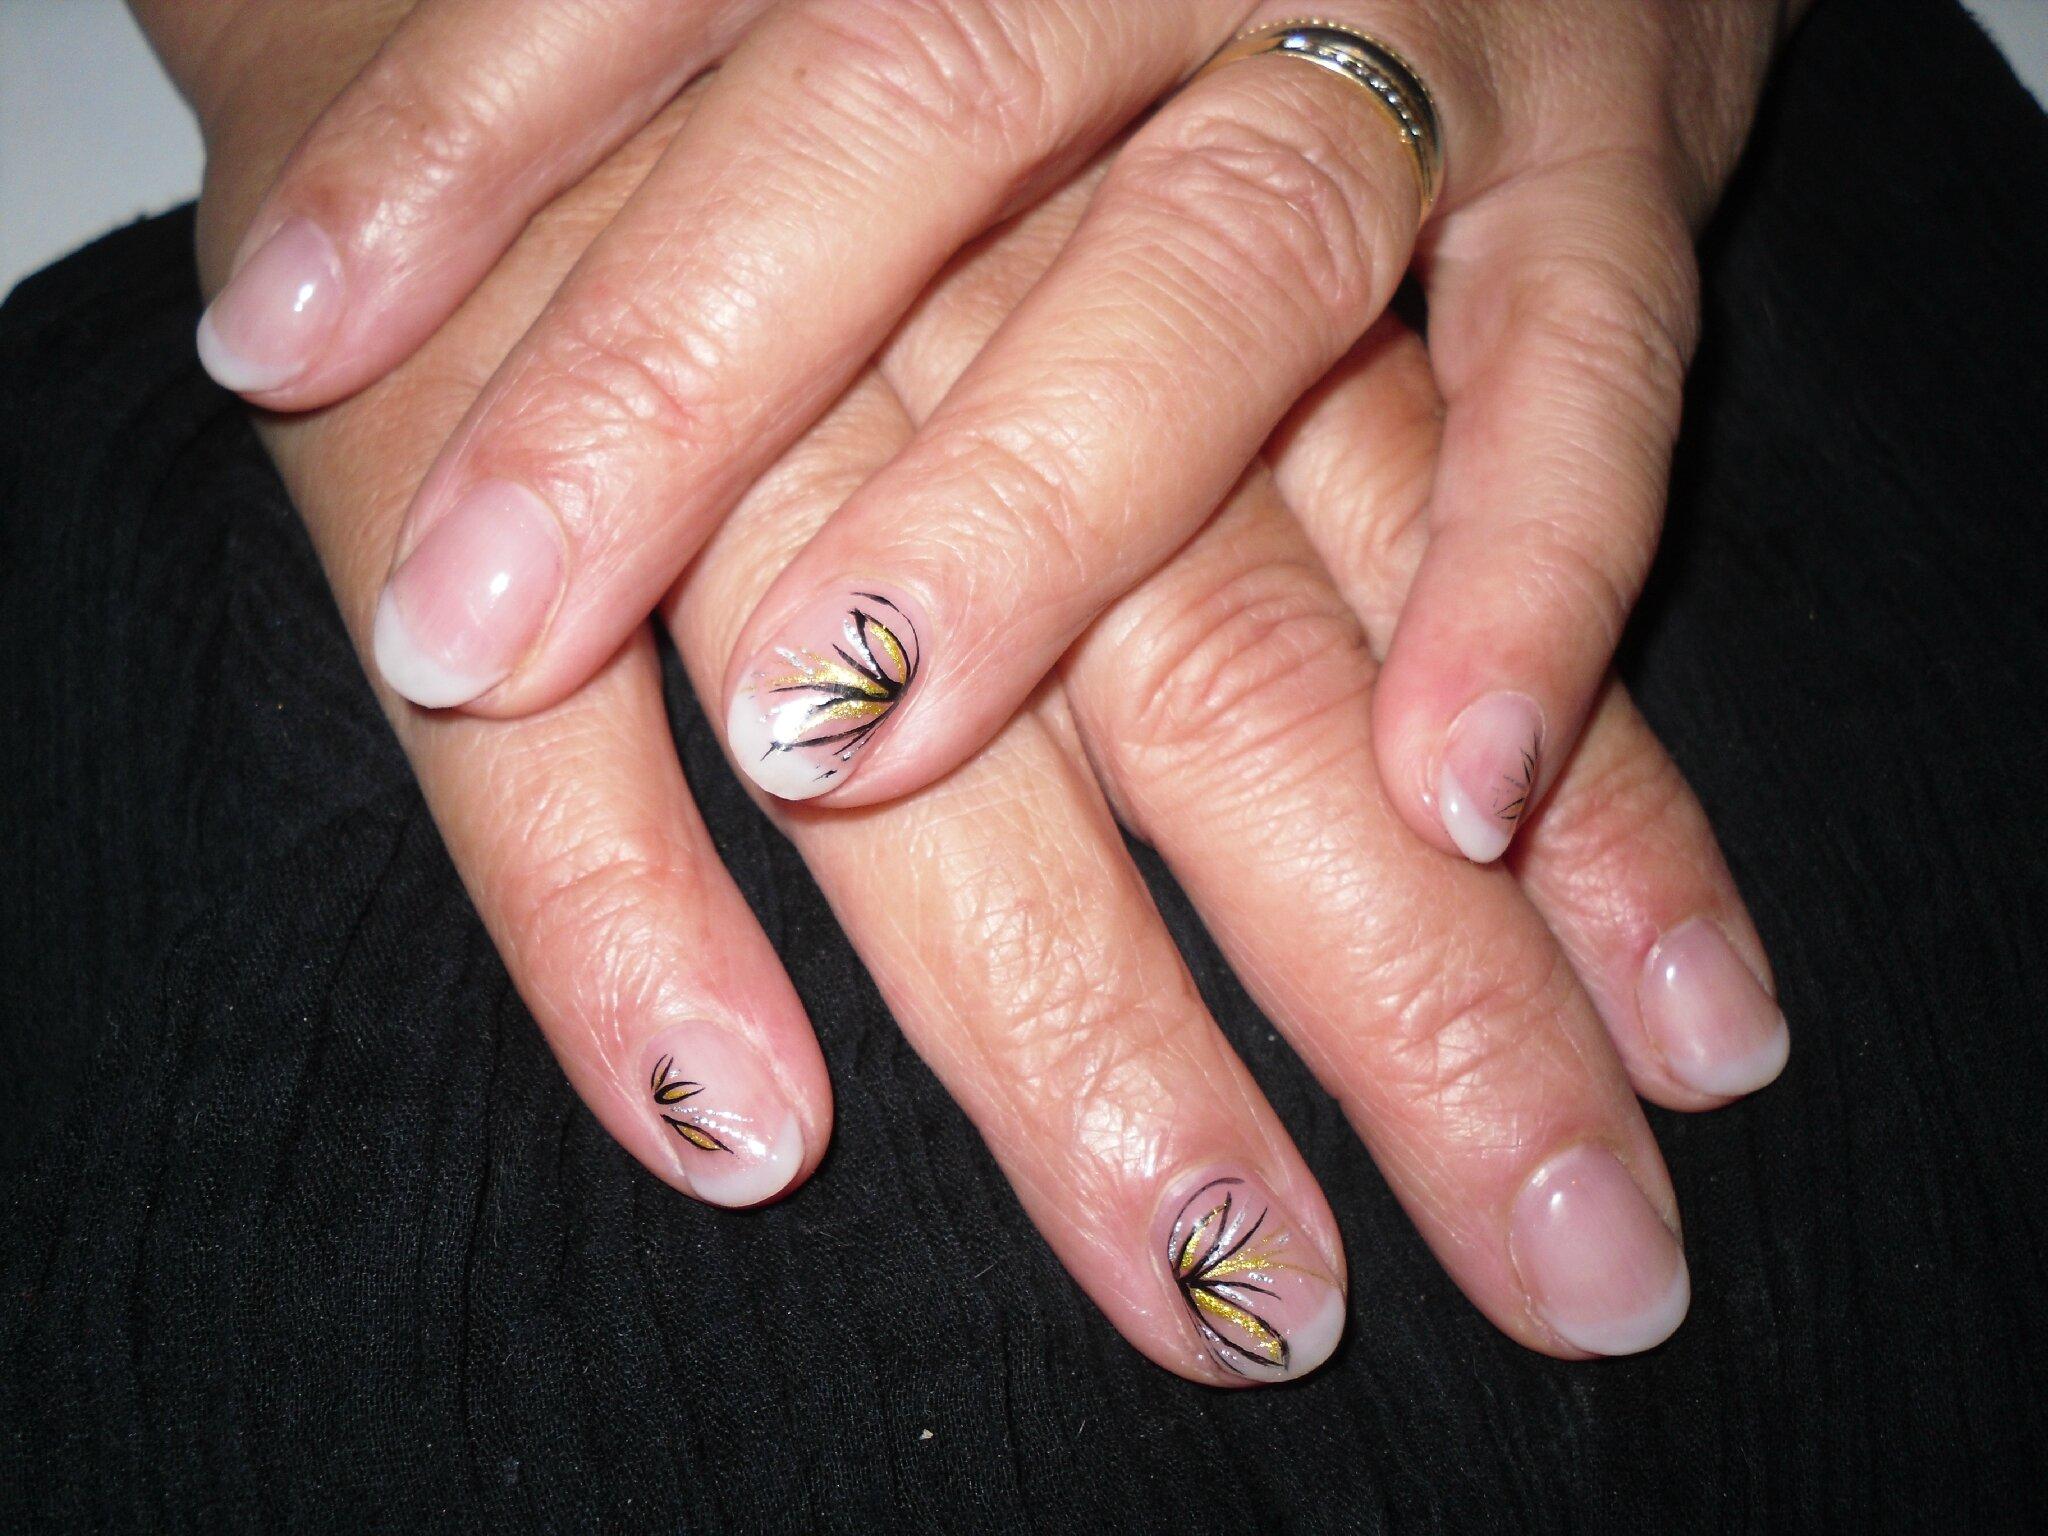 Passion 39 nail pose d 39 ongles en gel french nail art et deco personnalis e passion 39 nail - Ongle en gel amande ...